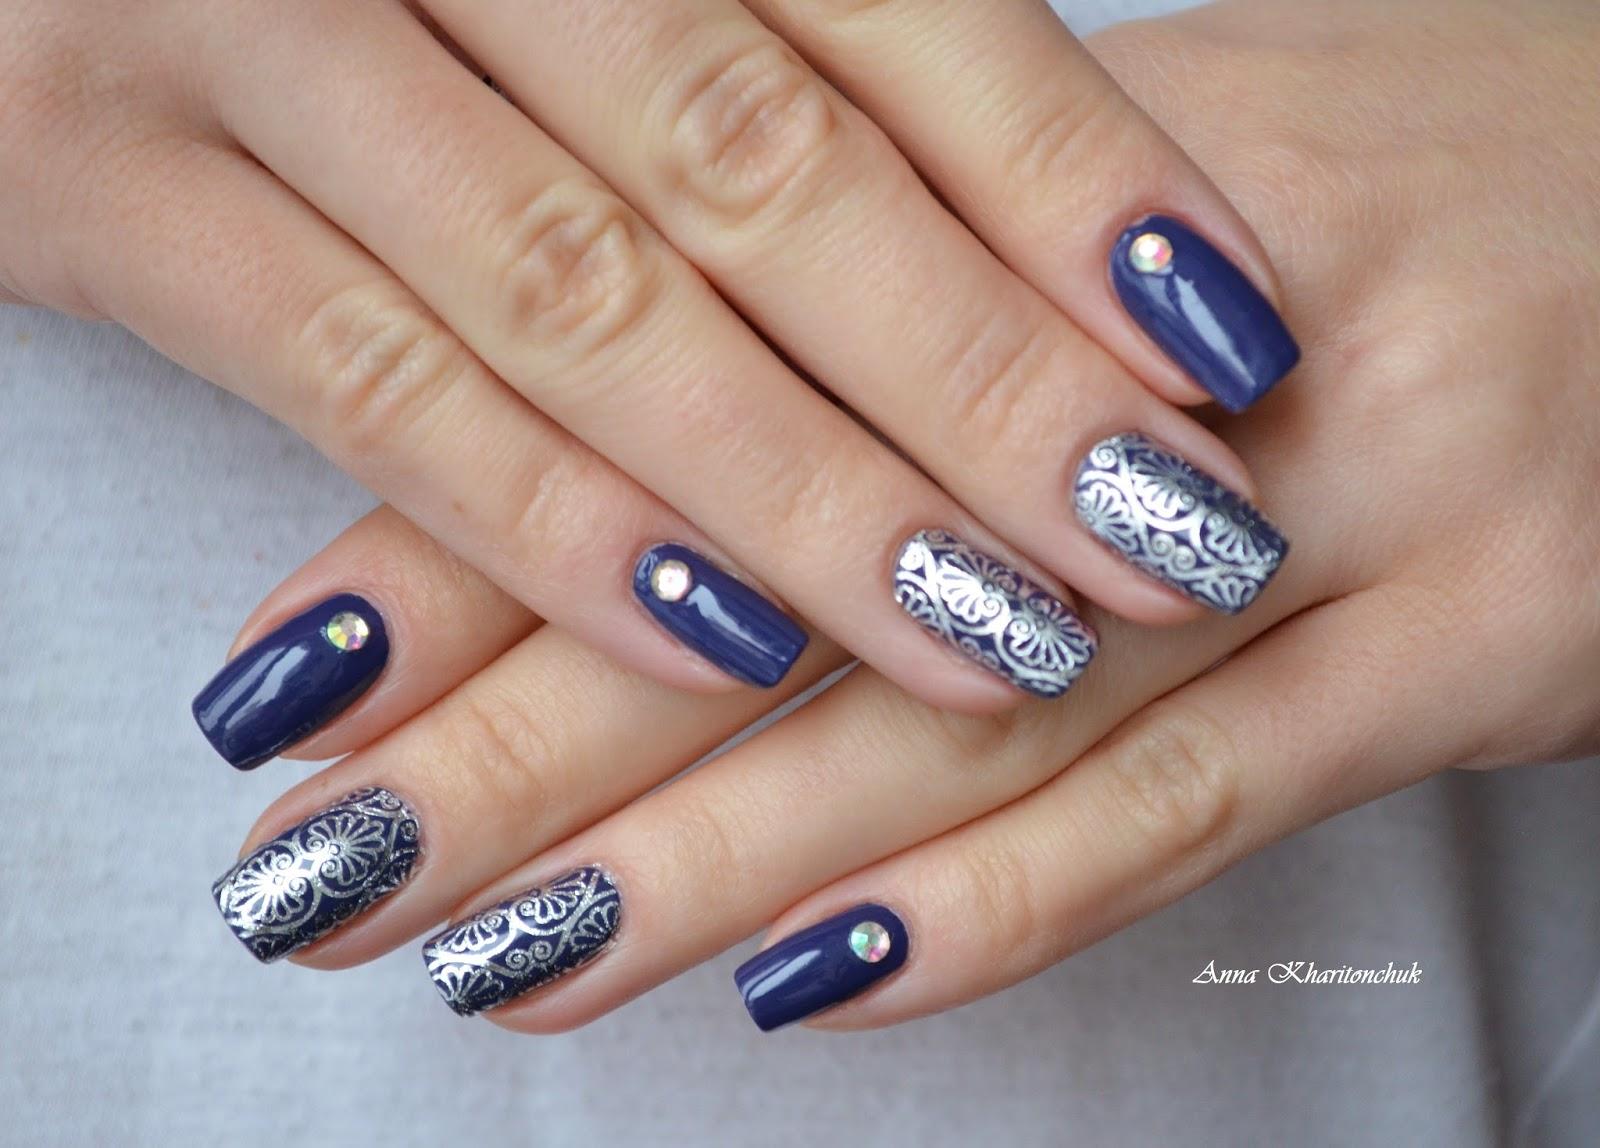 Winter11DNC: Синие ногти. China Glaze Queen B. Флешмоб 5 маникюров зимы